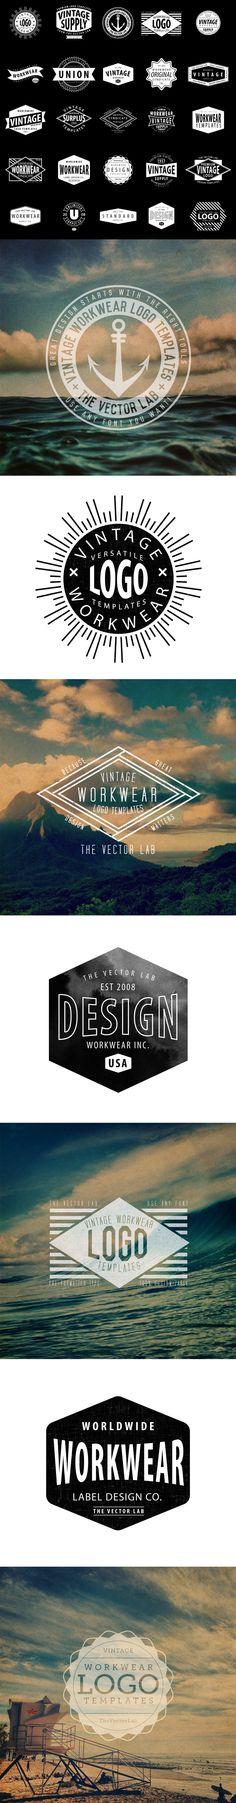 Logo Templates Vintage Workwear Logo templates, Adobe illustrator